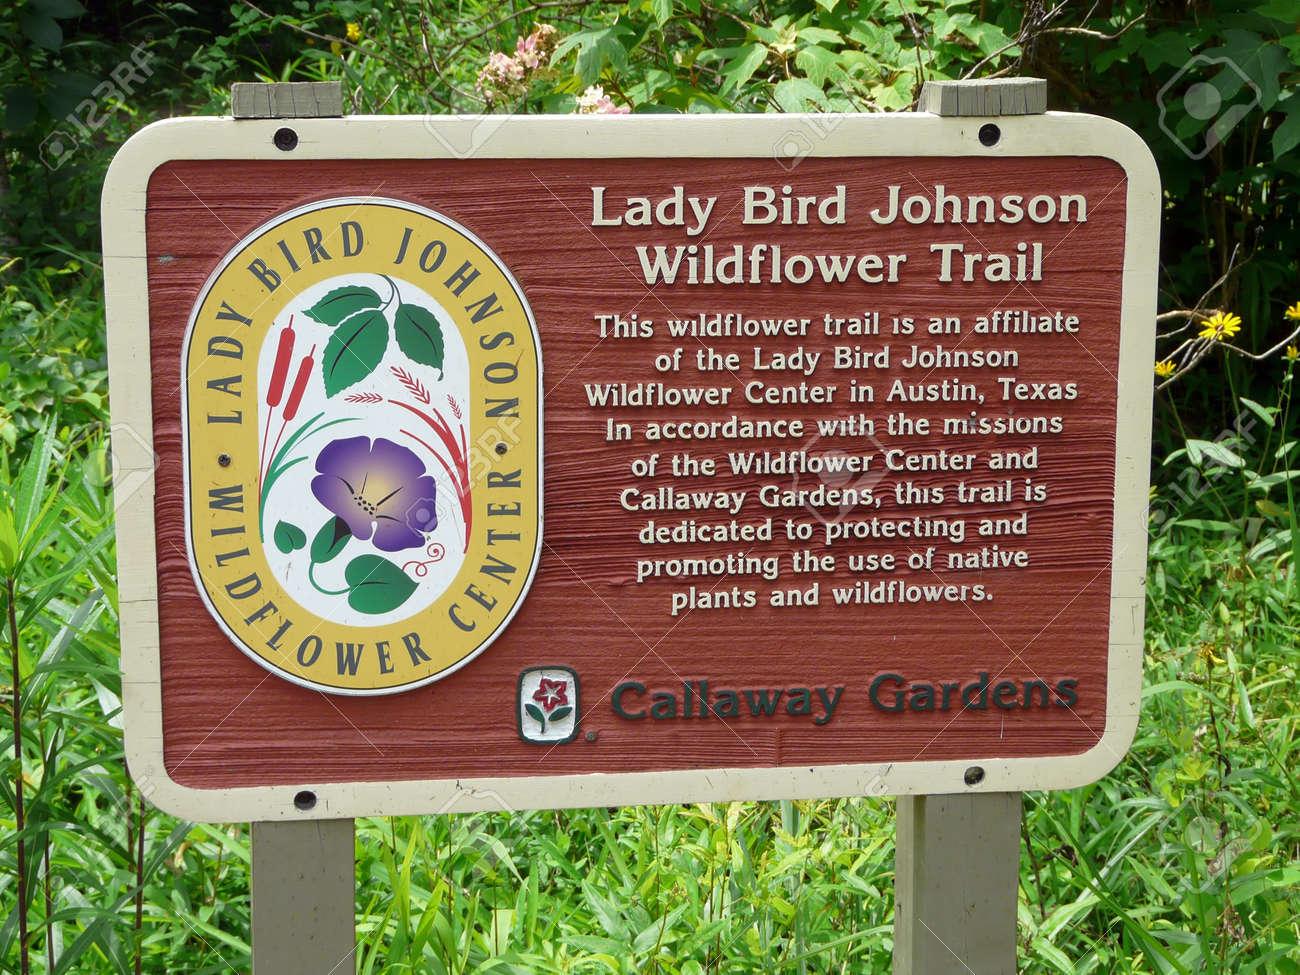 PINE MOUNTAIN, GEORGIA JUNE 5, 2018: This Sign At Callaway Gardens Indicates